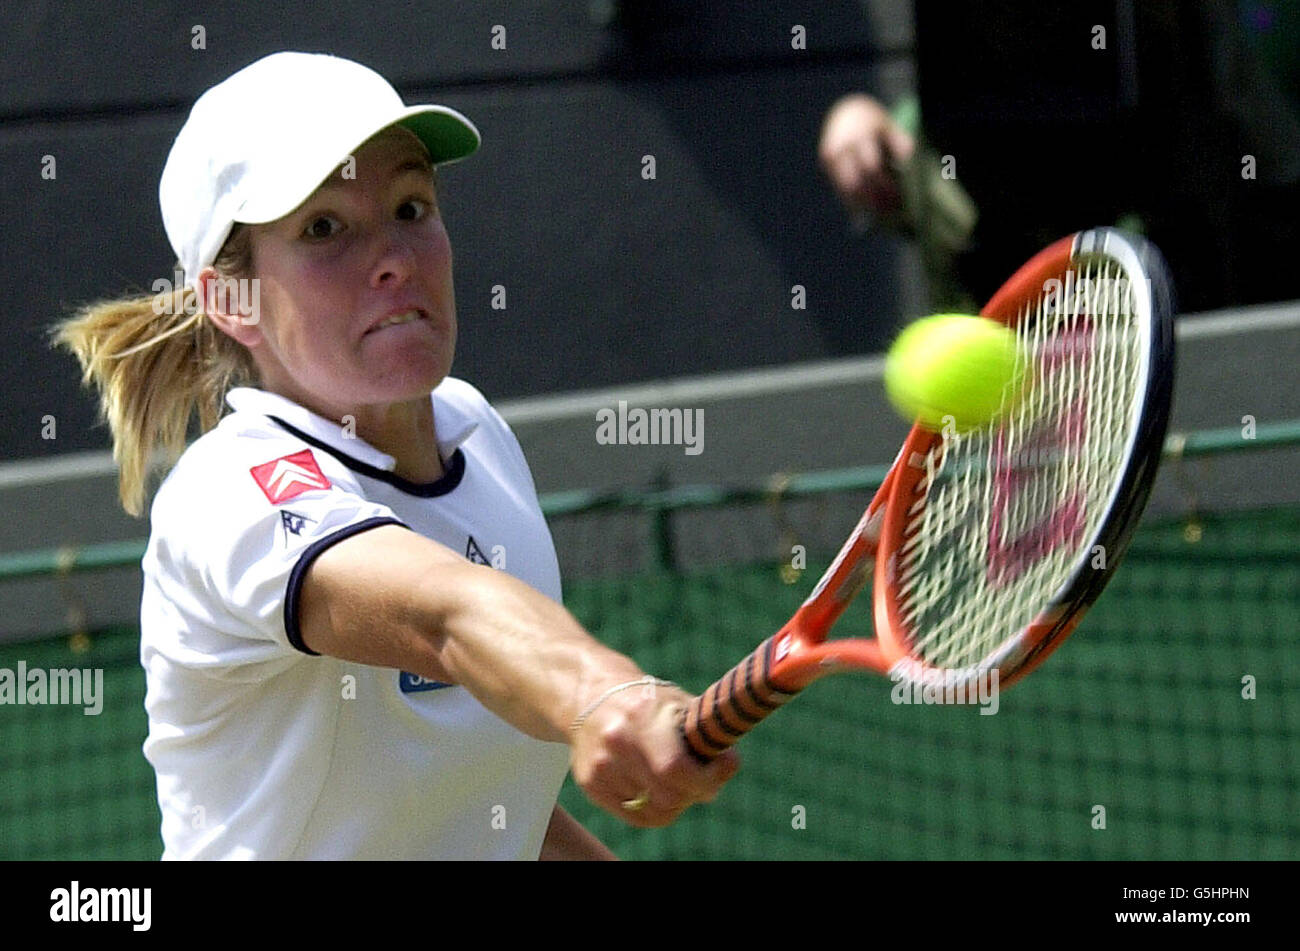 Wimbledon Justine Henin Stock Royalty Free Image